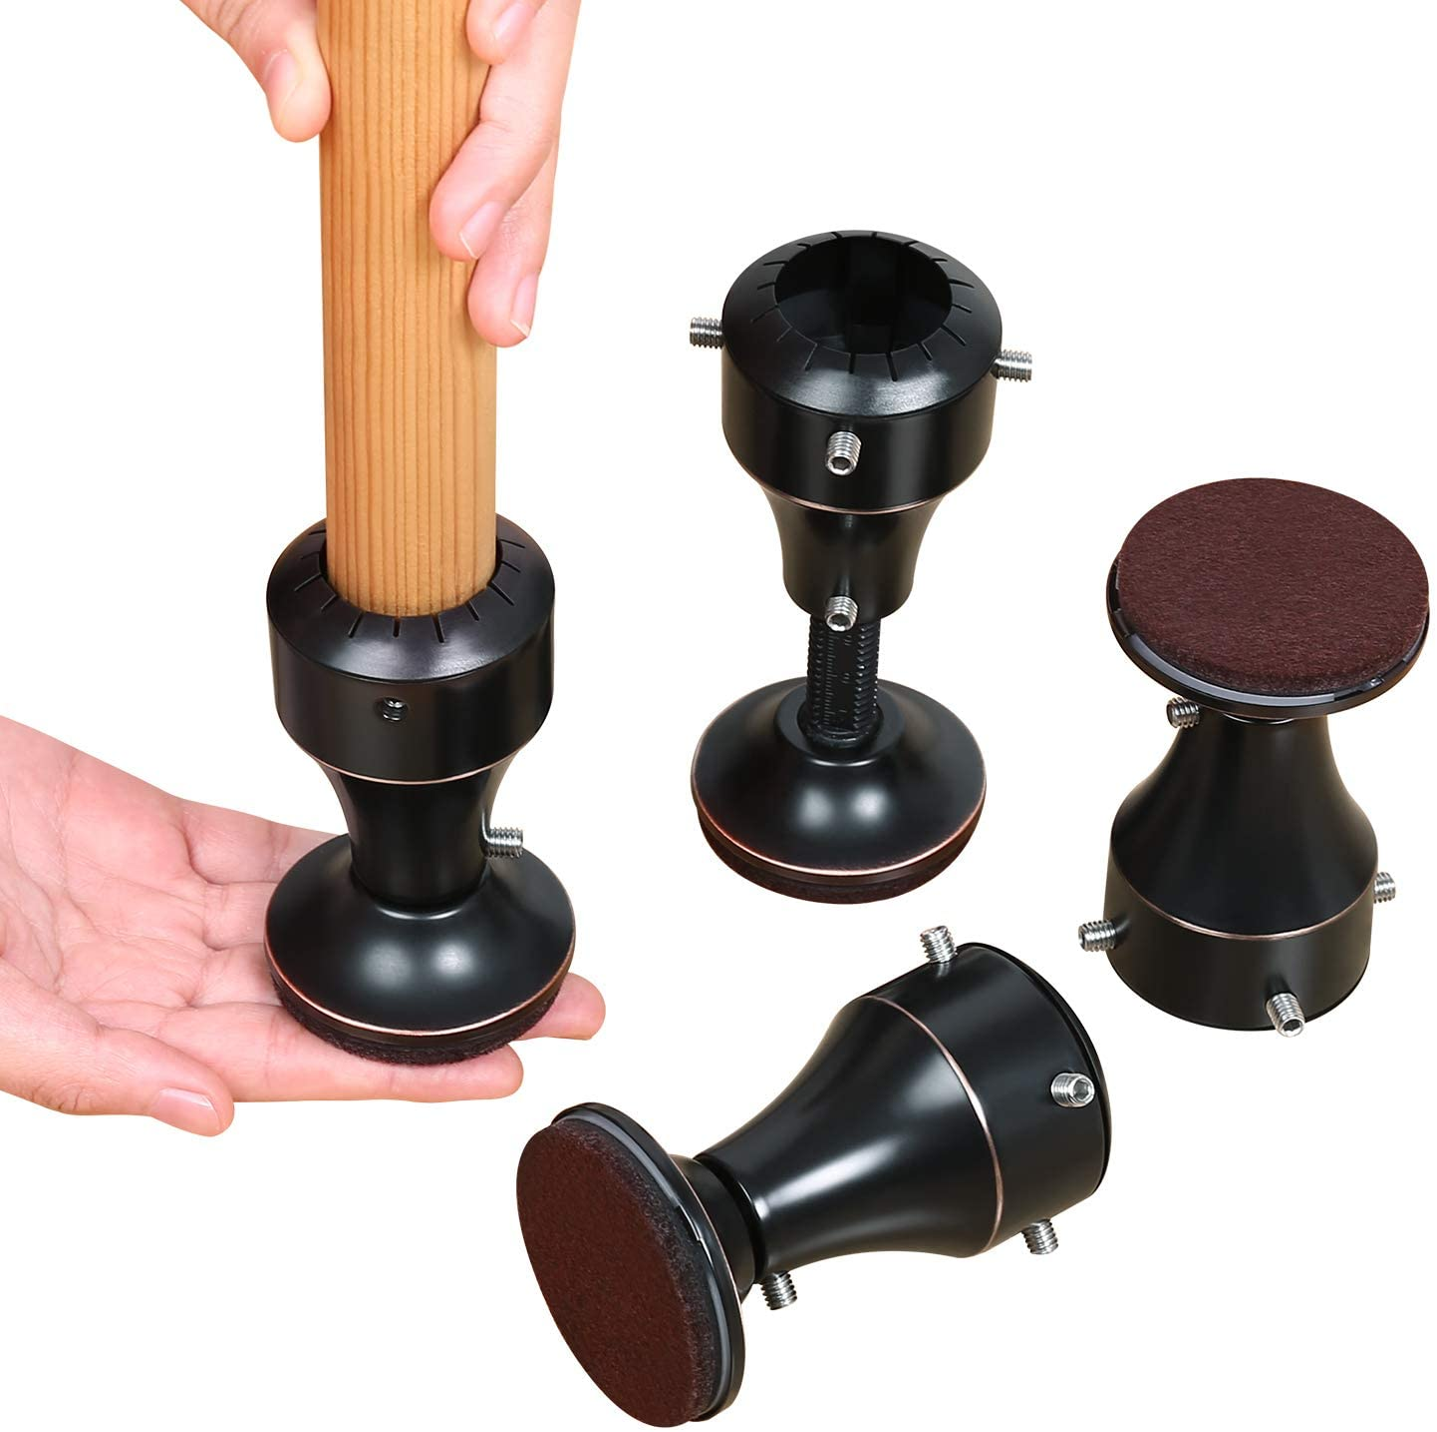 Ezprotekt Fits Chair Table Desk Sofa Feet Diameter from 1-1/8